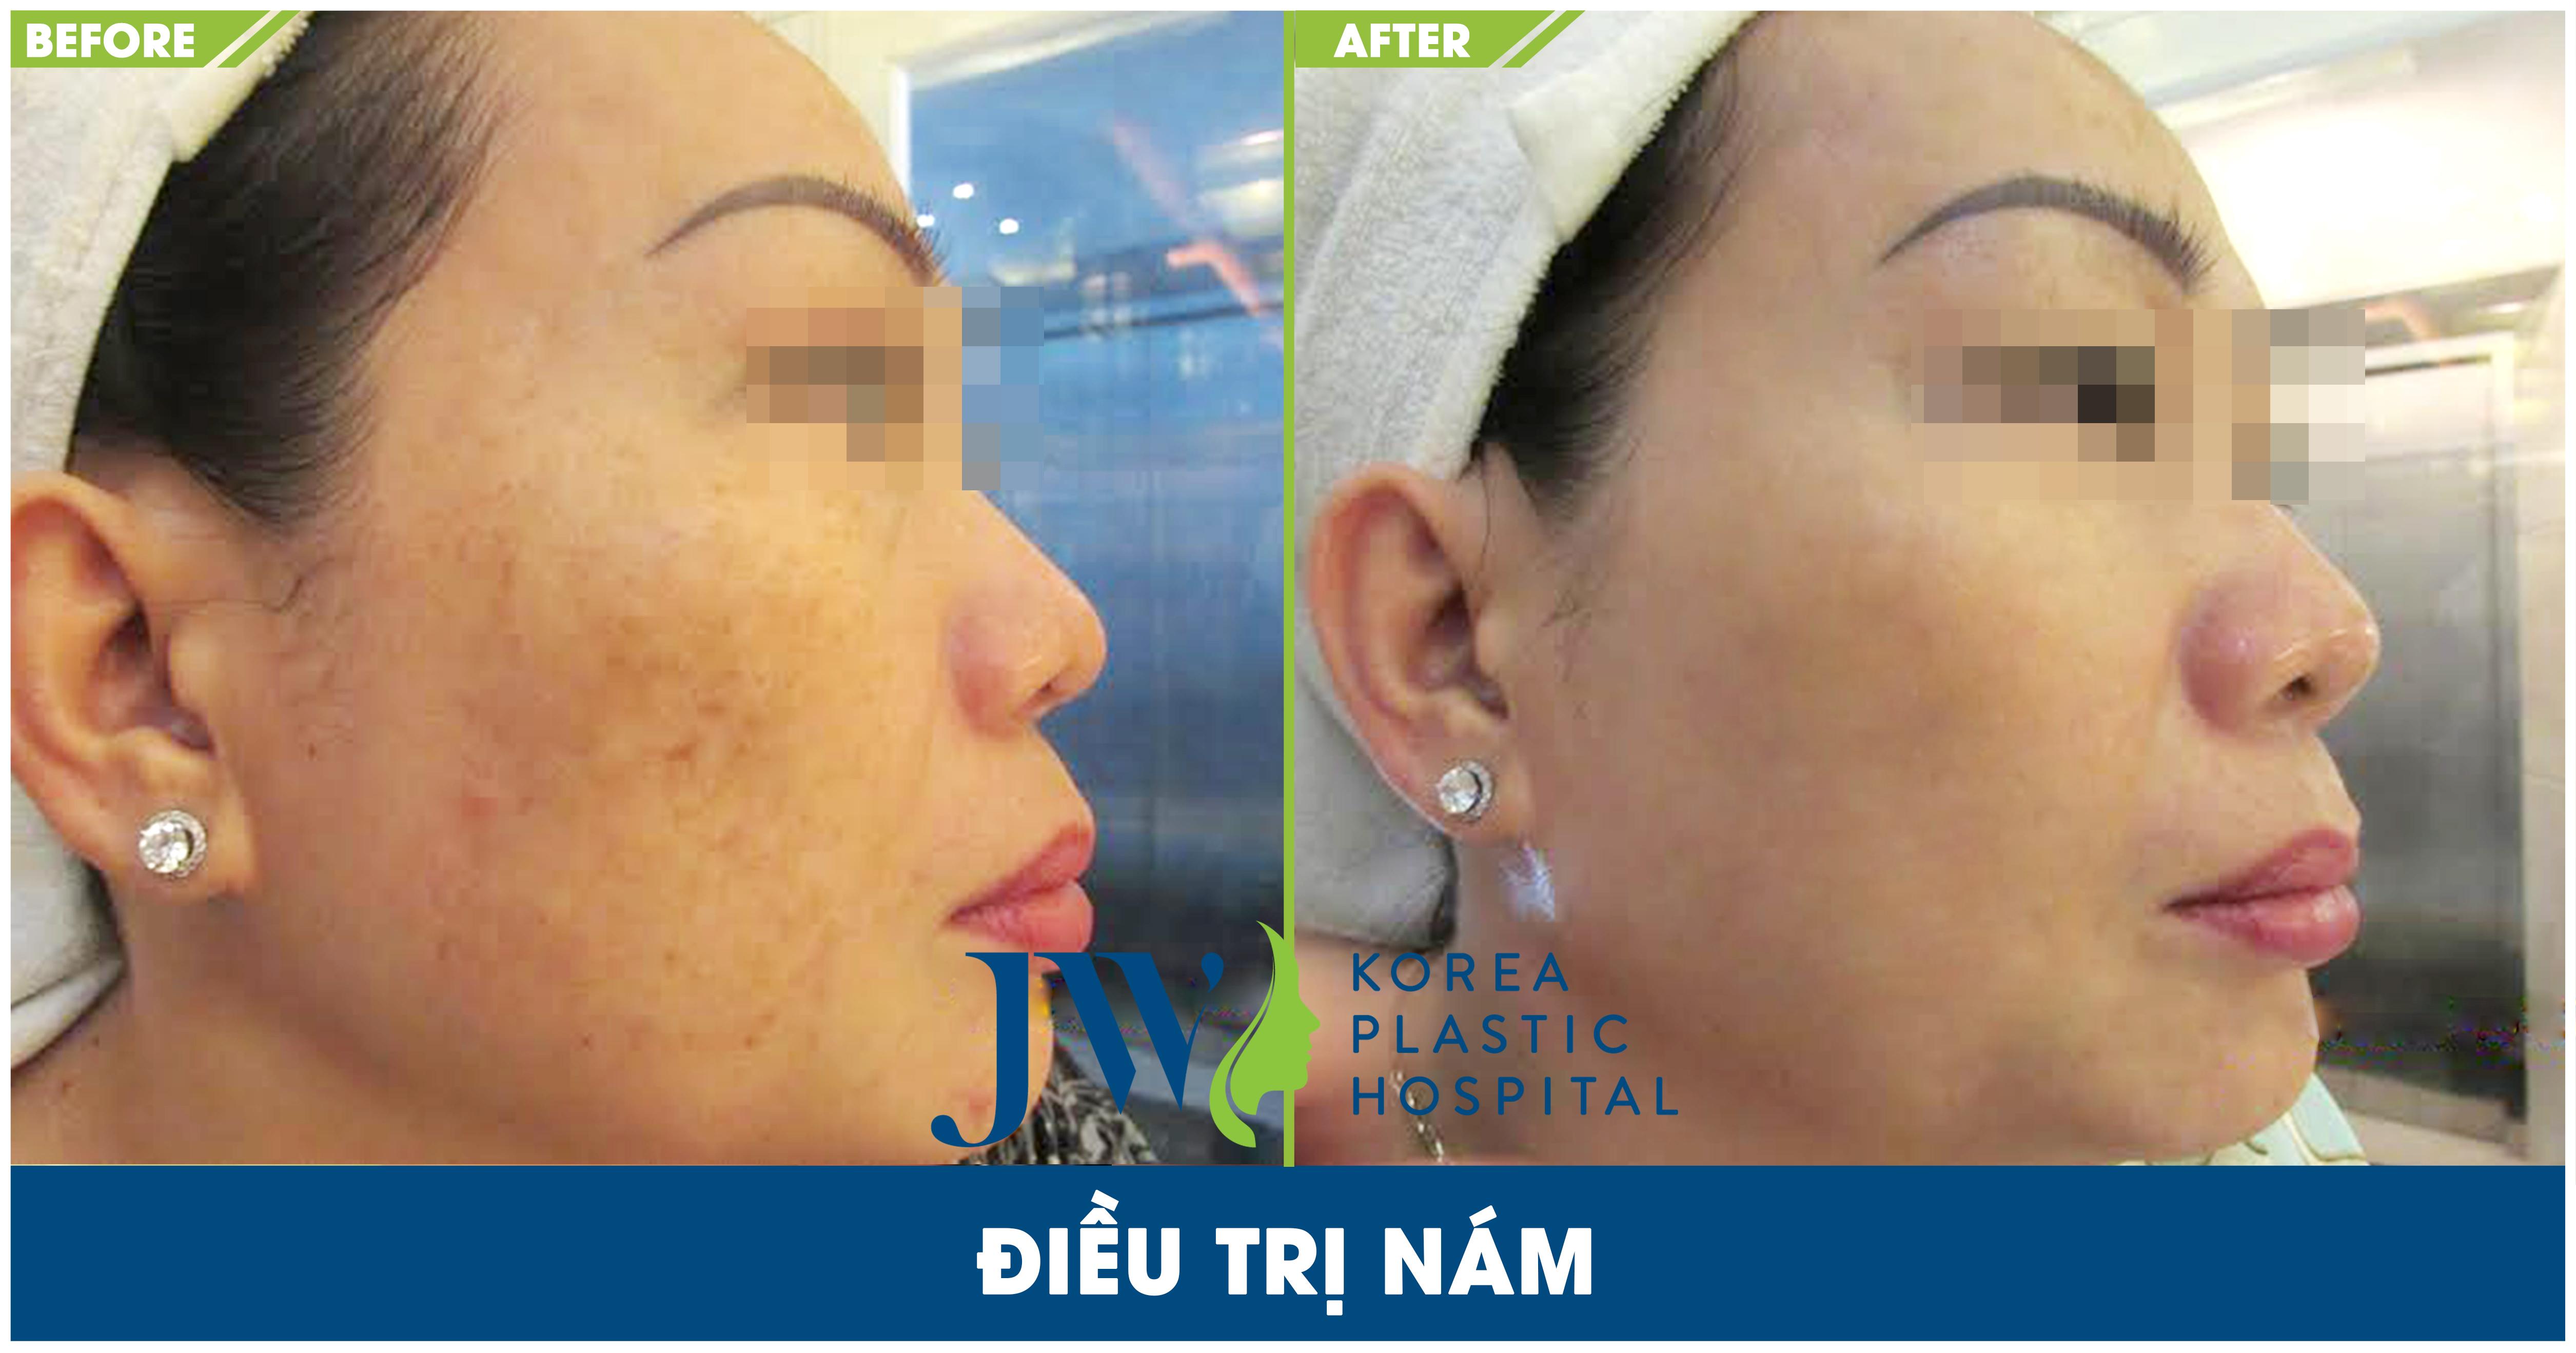 Một số hình ảnh sau khi trị nám tại Skincare JW